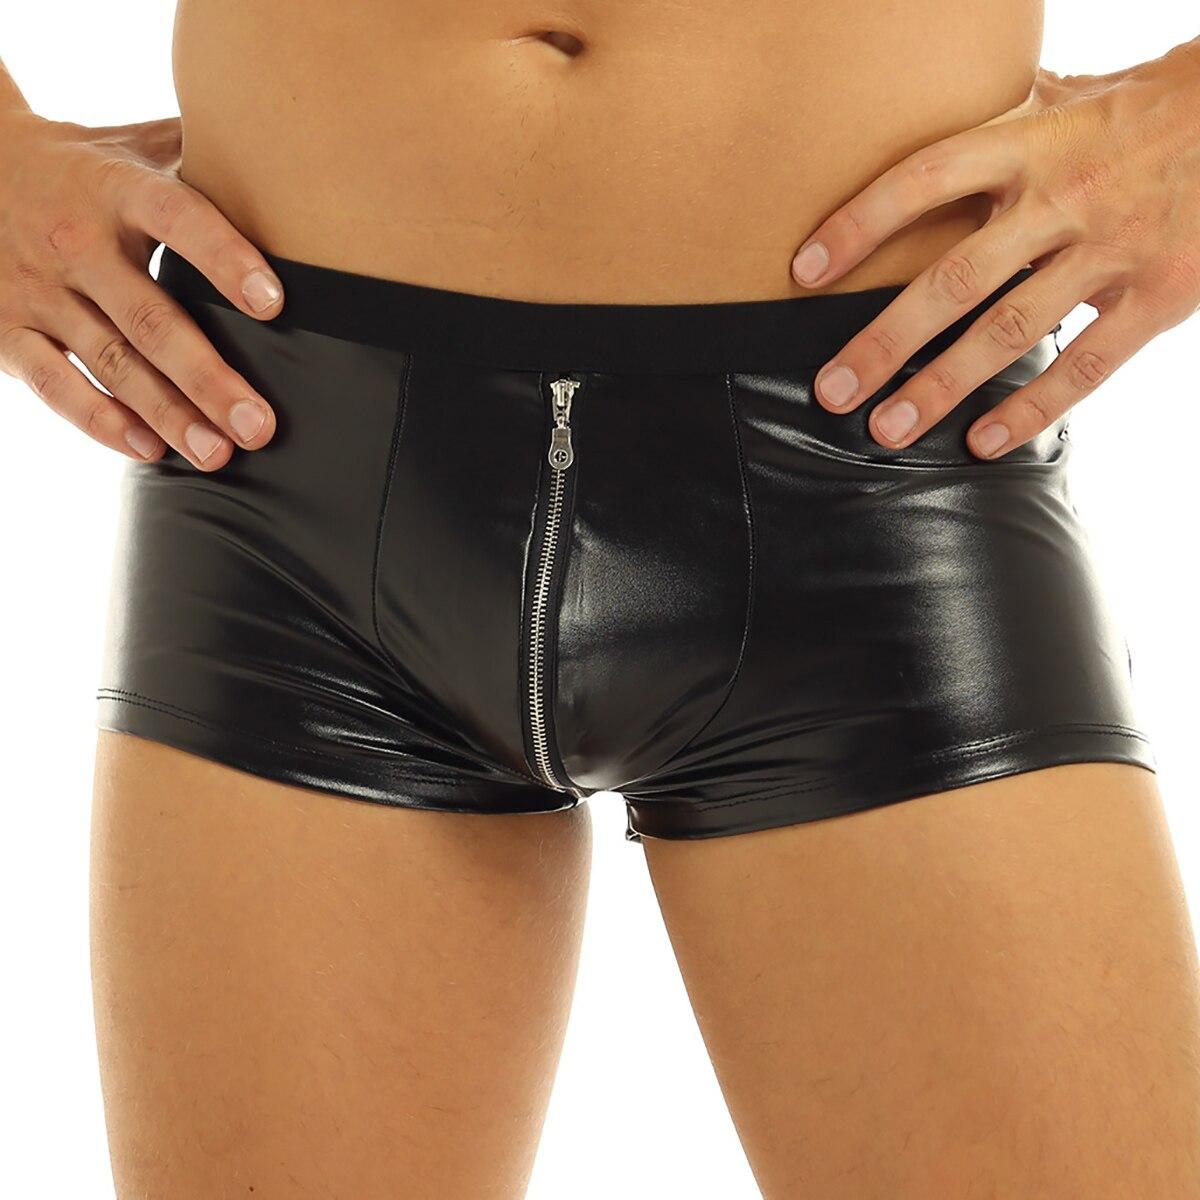 Mens Fashion Club Shorts Lingerie Wet Look Boxer Briefs Zipper Open Crotch Jockstraps Bulge Pouch Sexy Male Underwear Underpants